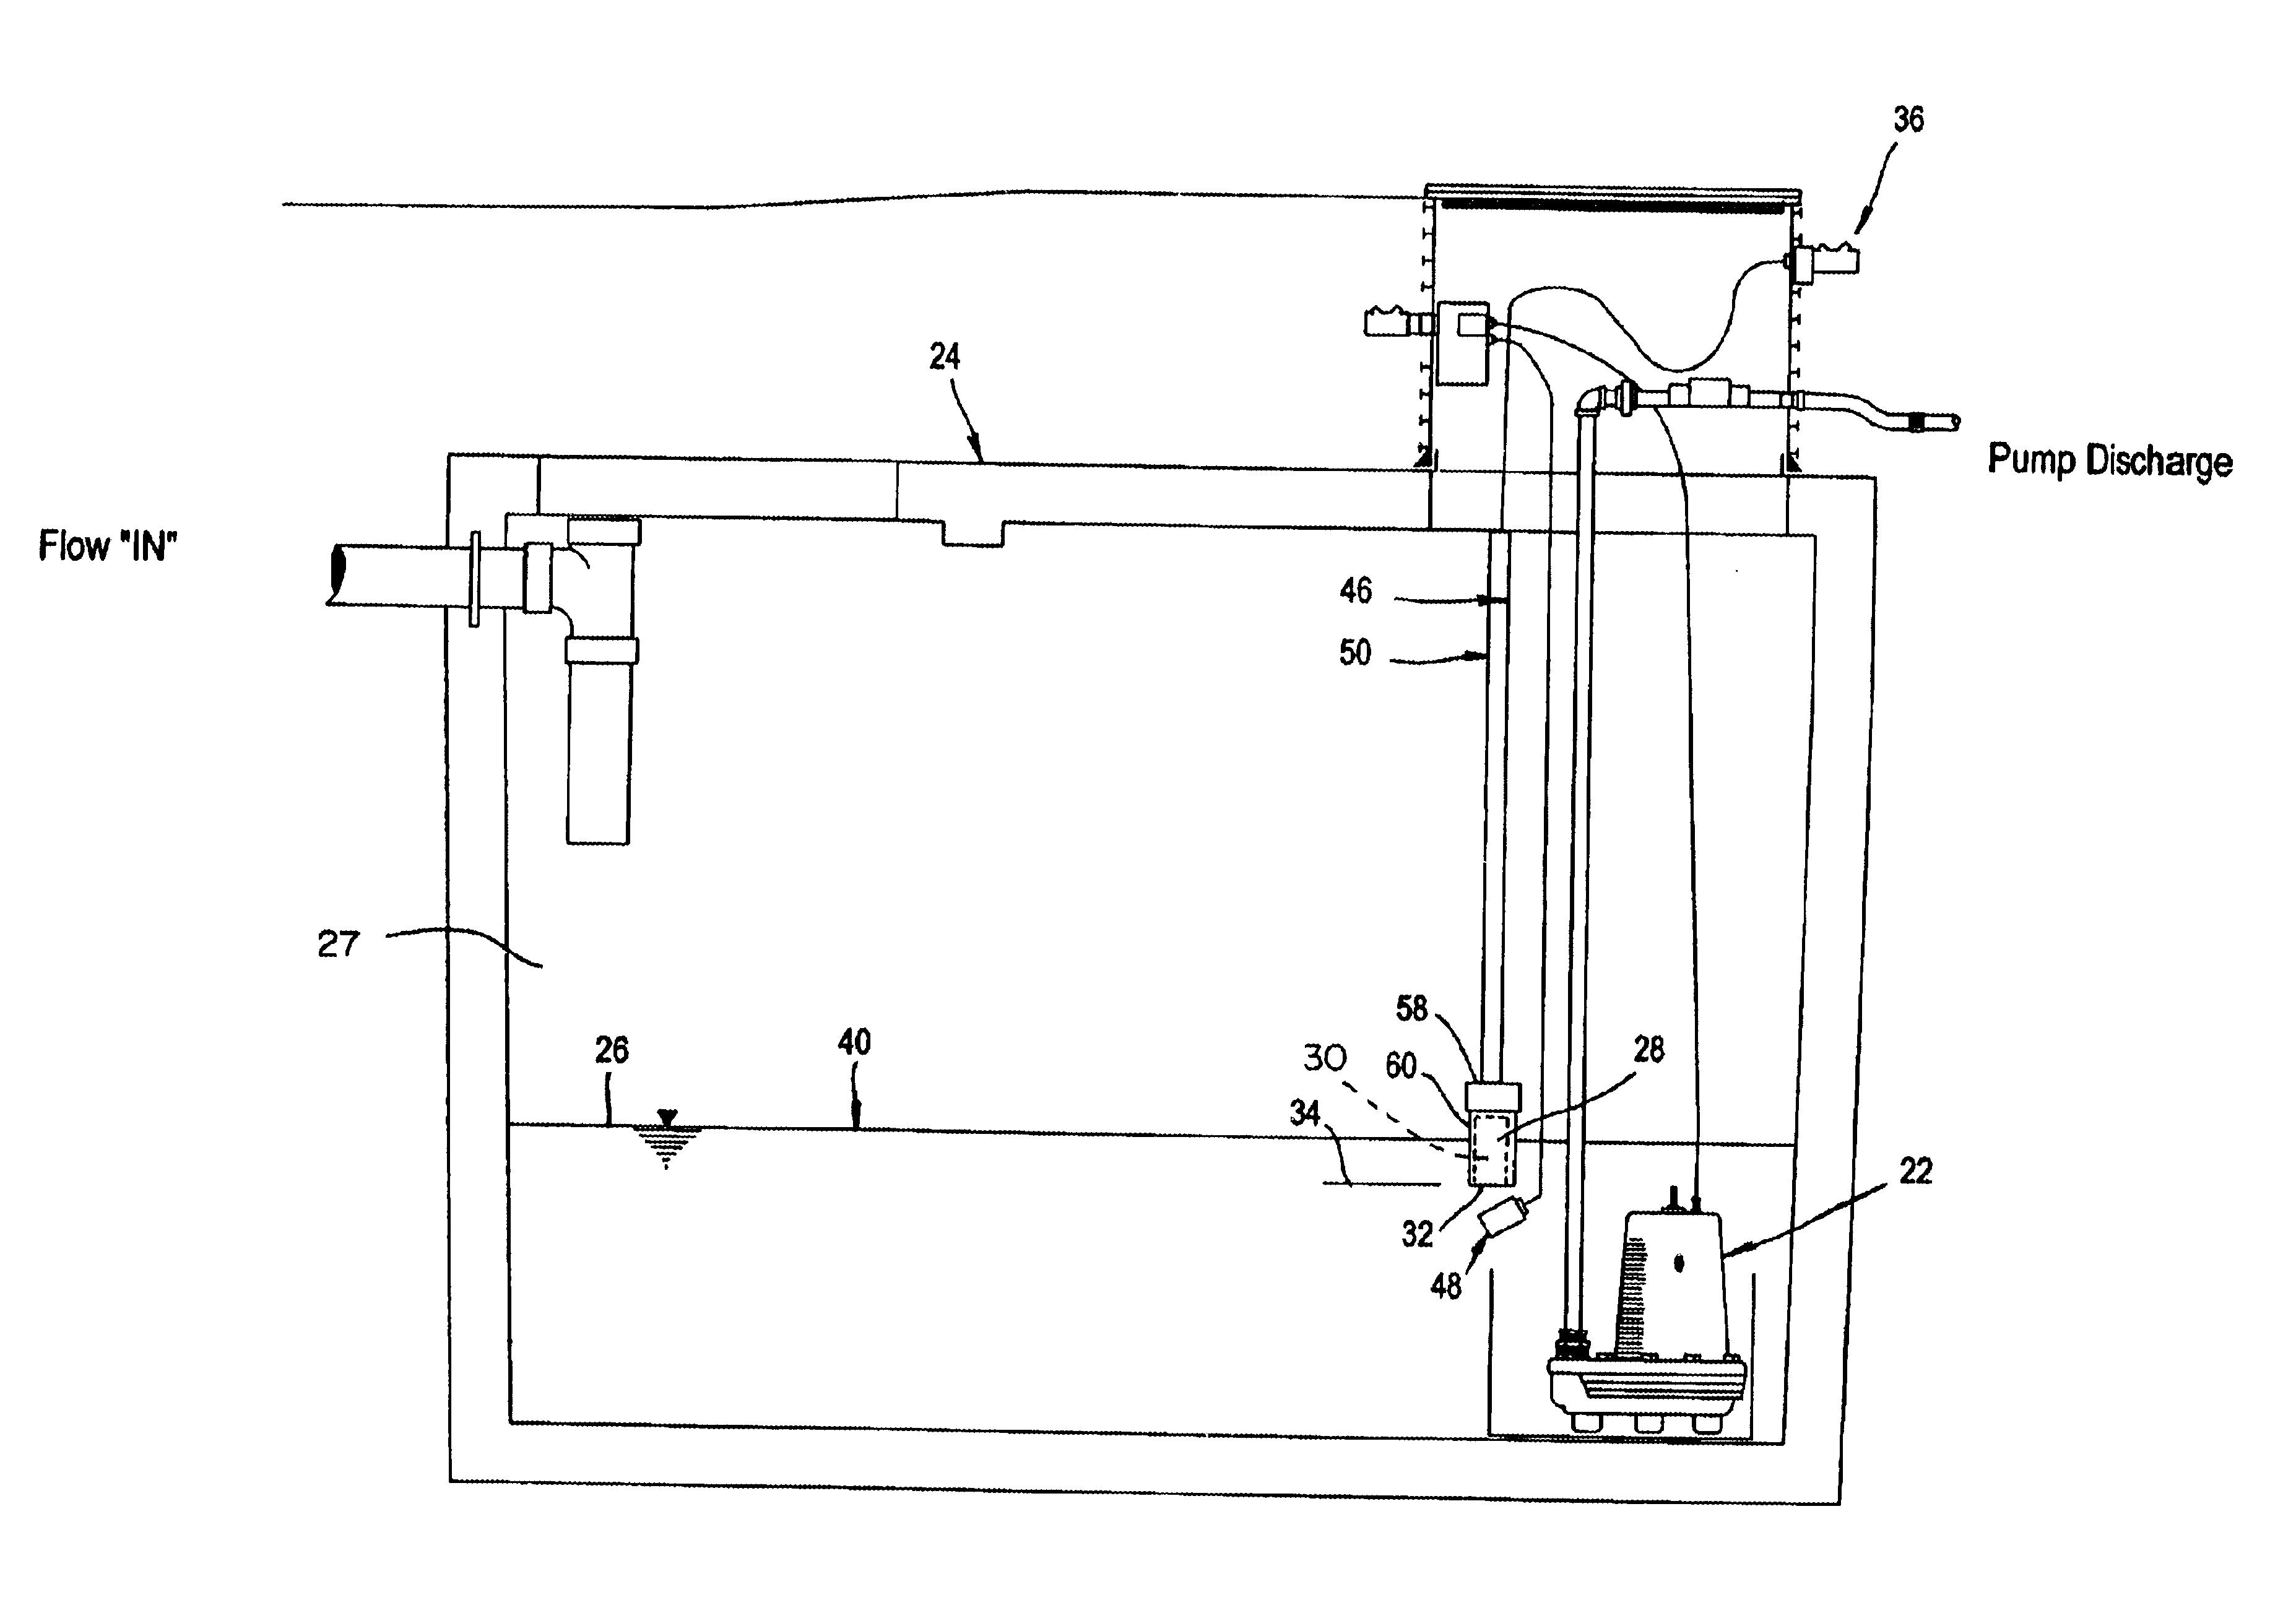 minicas ii wiring diagram - image mag, Wiring diagram